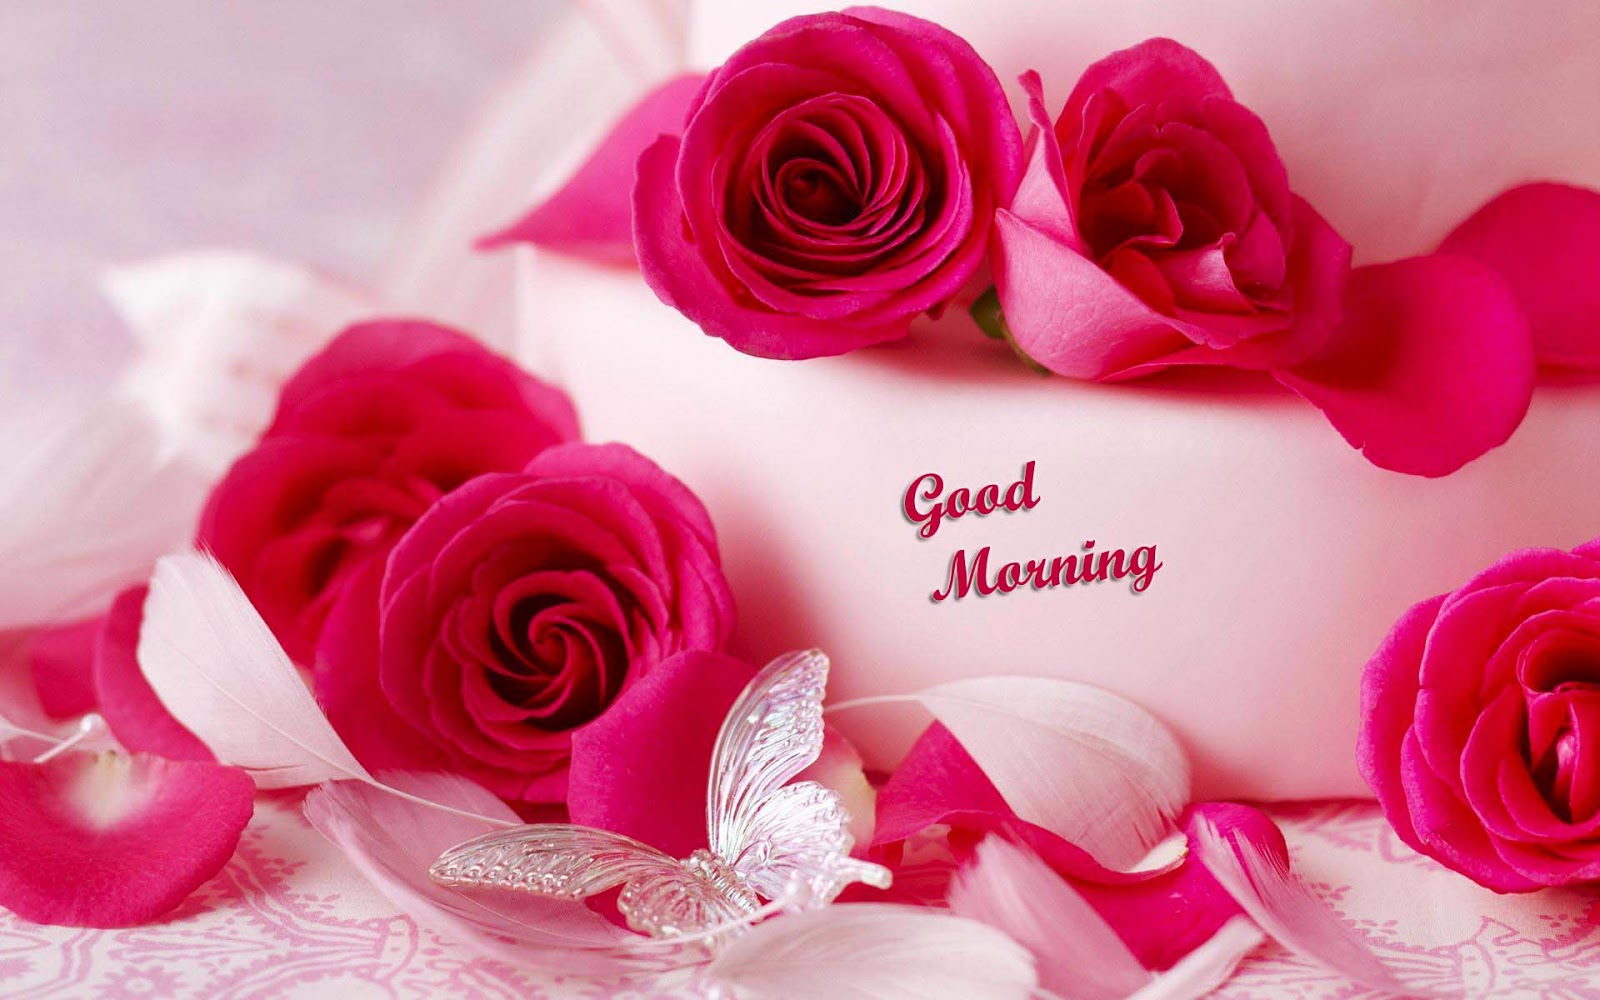 Good Morning Image - Beautiful Romantic Good Morning , HD Wallpaper & Backgrounds